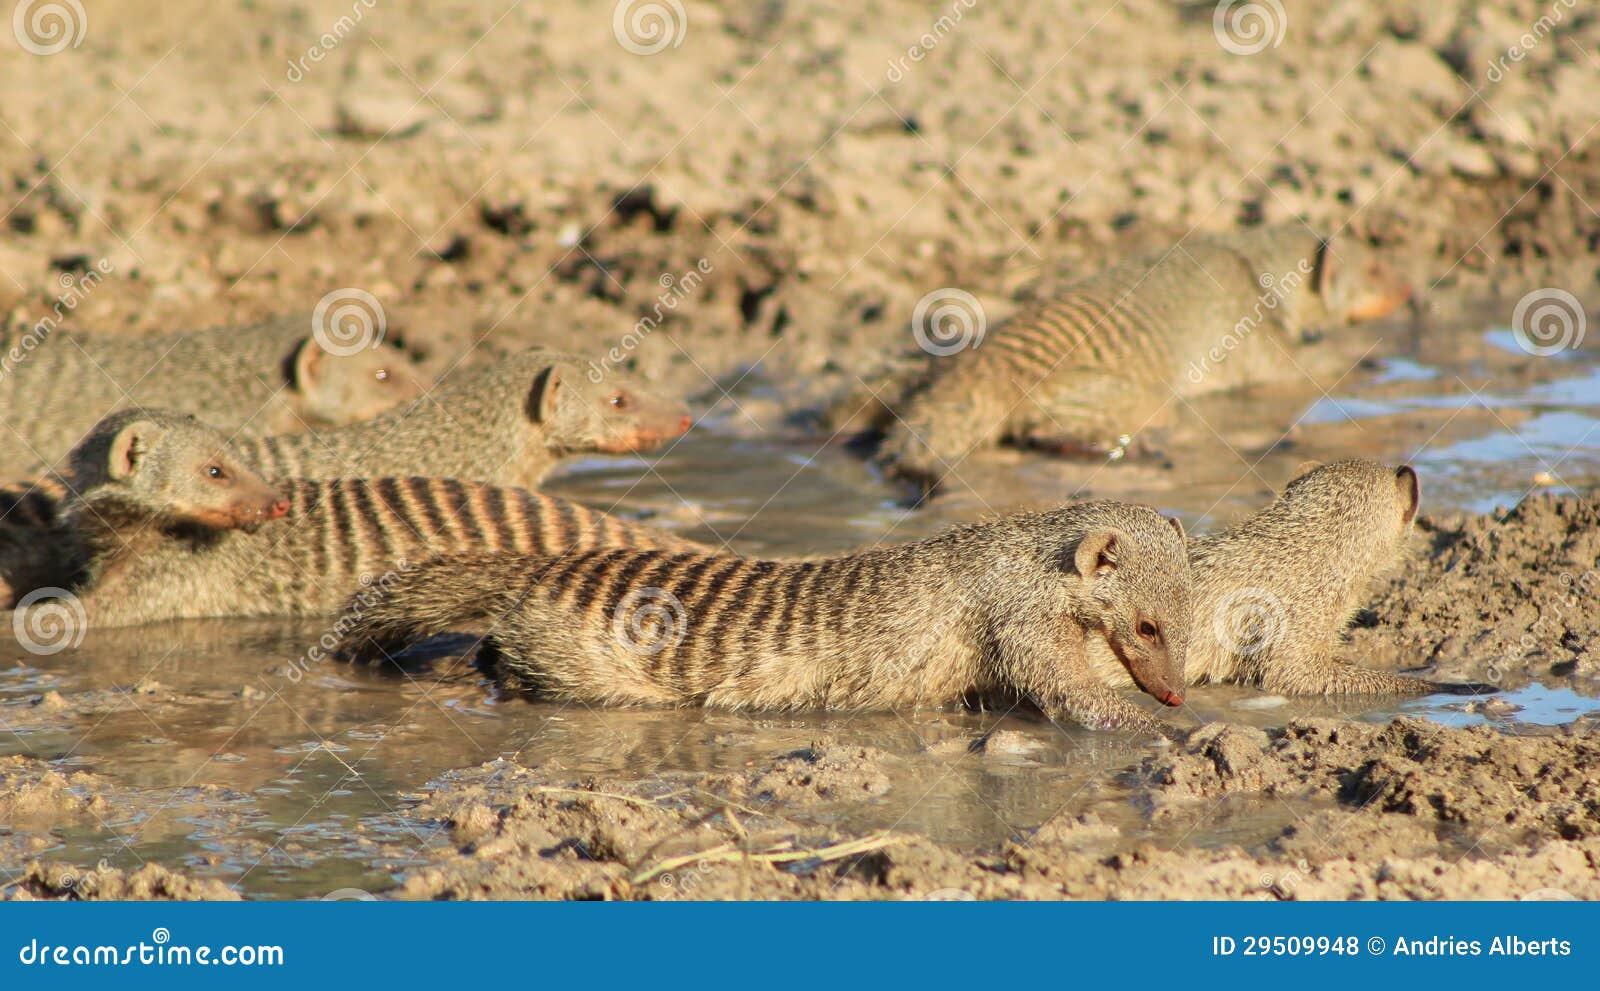 Het Afrikaanse Wild - Gestreepte Mongoes, - Band van Broers 3